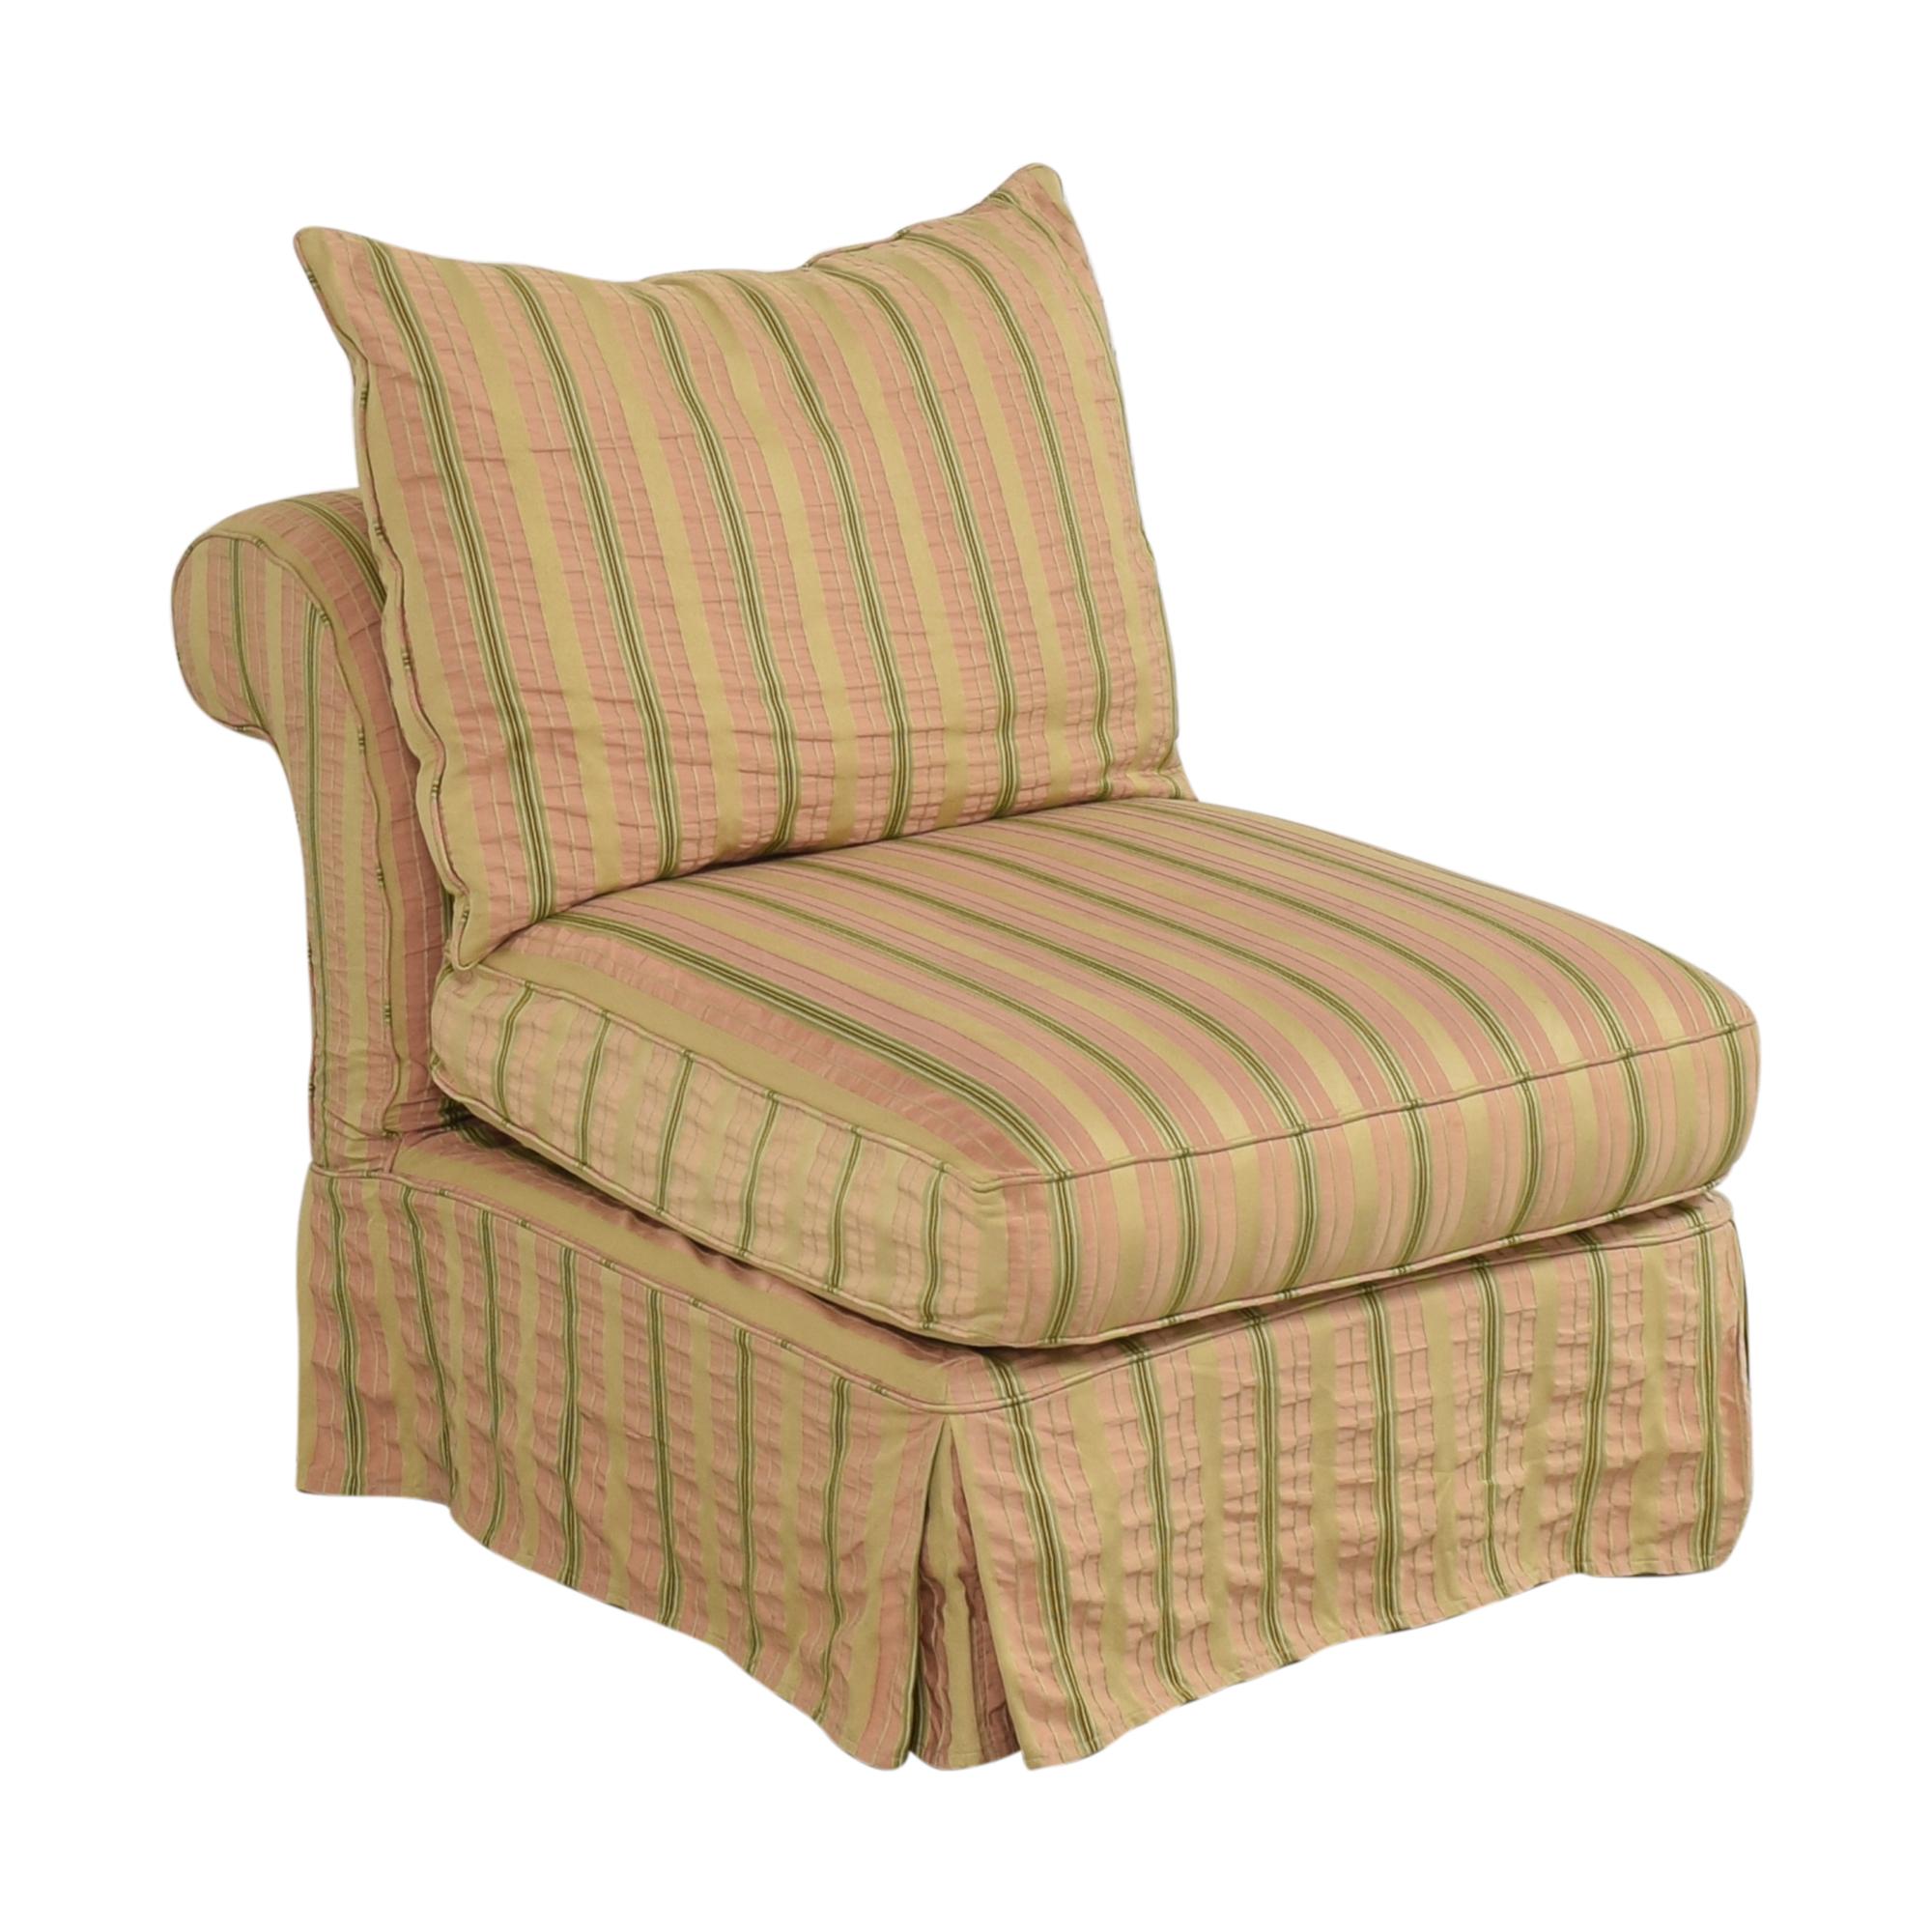 Domain Home Domain Home Slipcovered Slipper Lounge Chair price